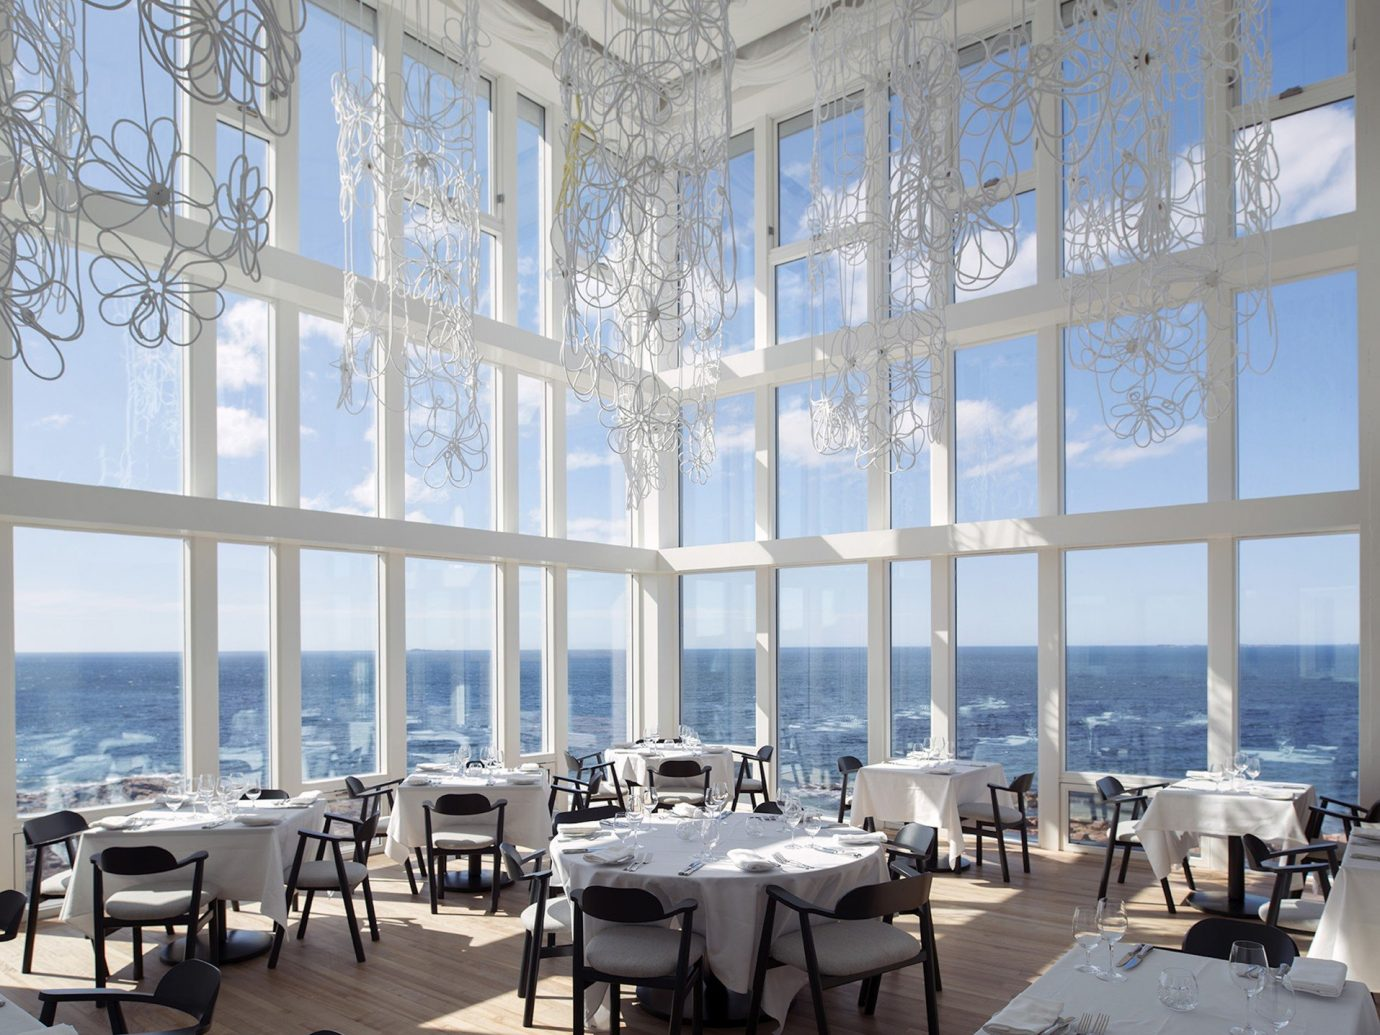 Beach Hotels Islands Luxury Travel Trip Ideas indoor window Architecture estate interior design Design headquarters convention center palace plaza several